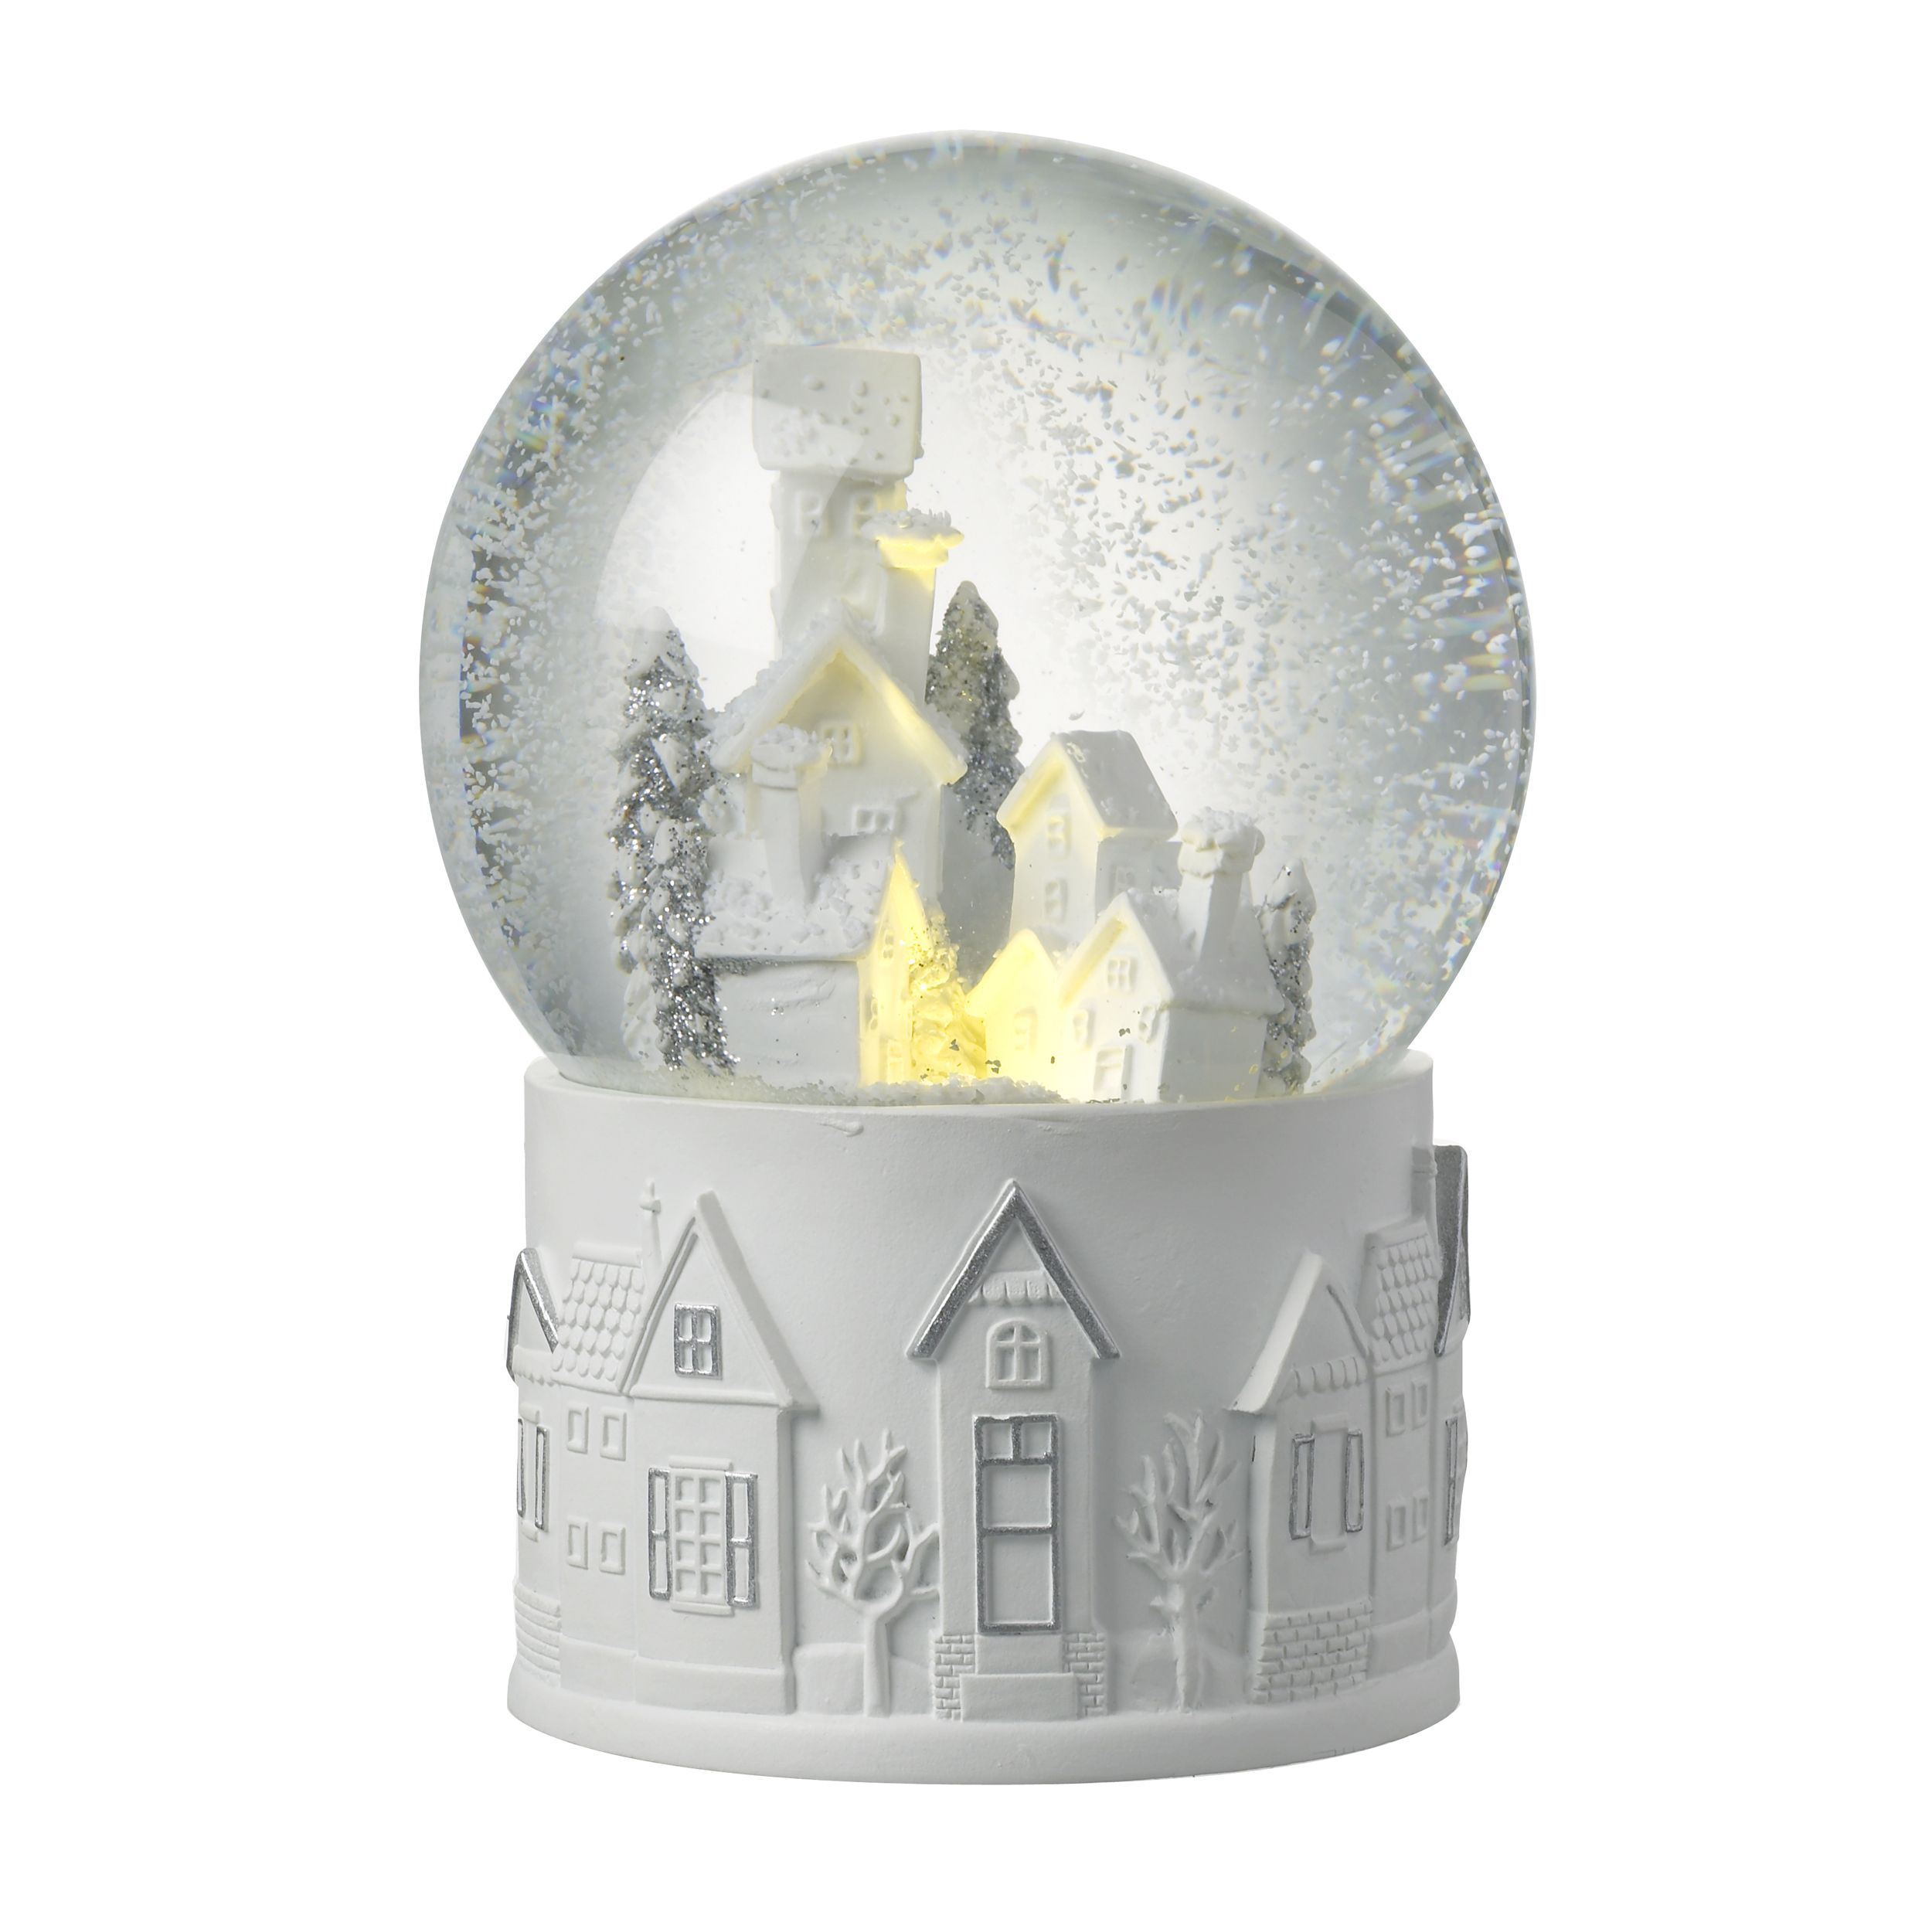 20 Best Christmas Snow Globes - Christmas Home Decor